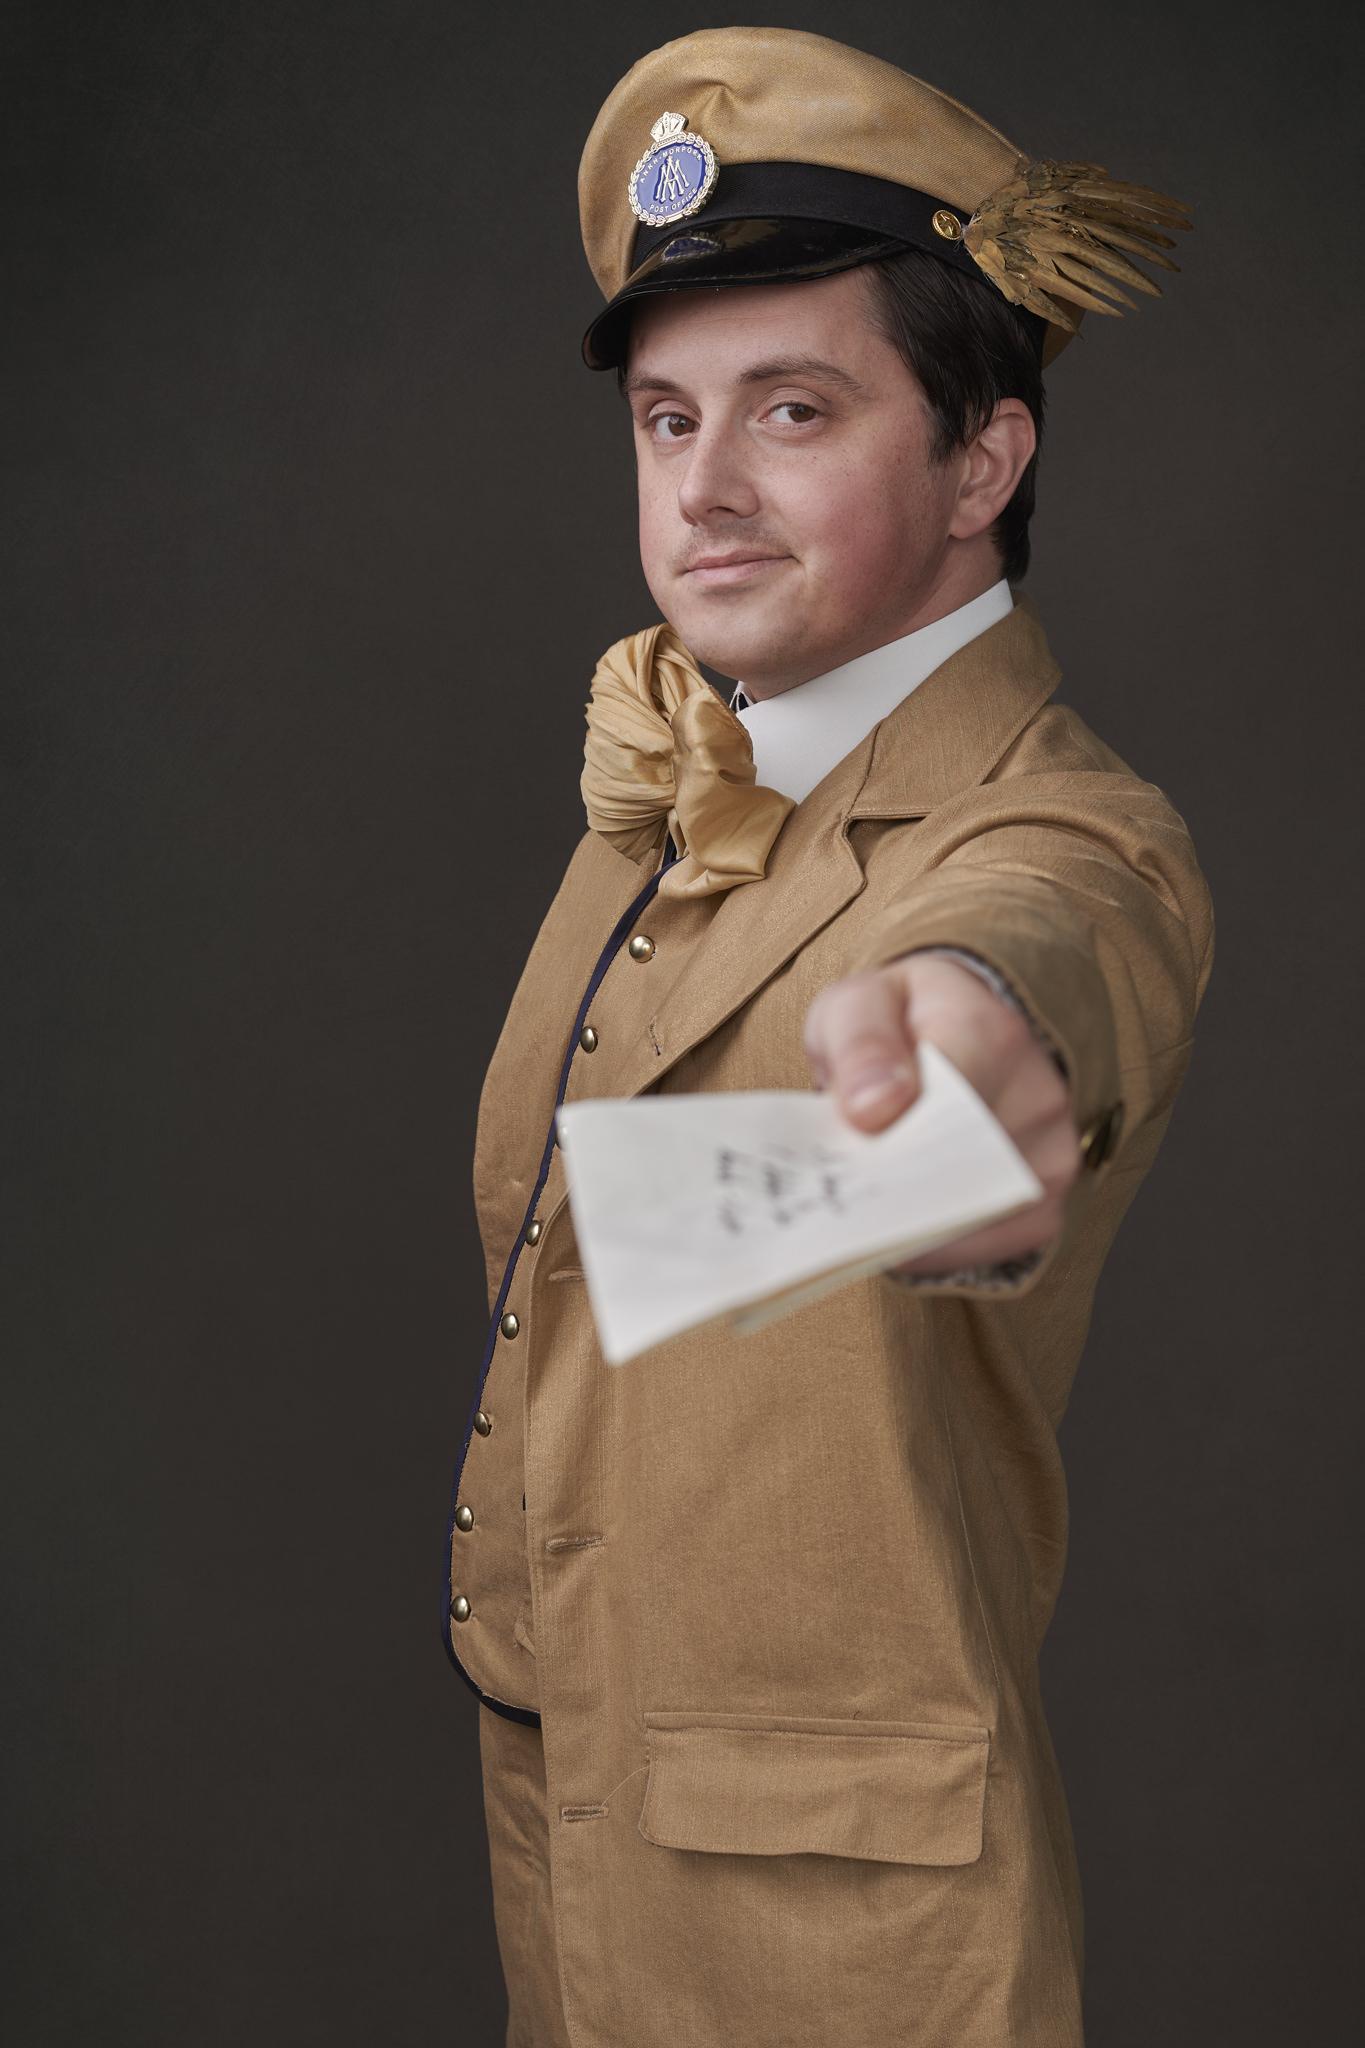 Ben Marcum Photography-Louisville-Portrait Photographer-Portraits-Ravenclaw-Disk WorldJun 04 20181215